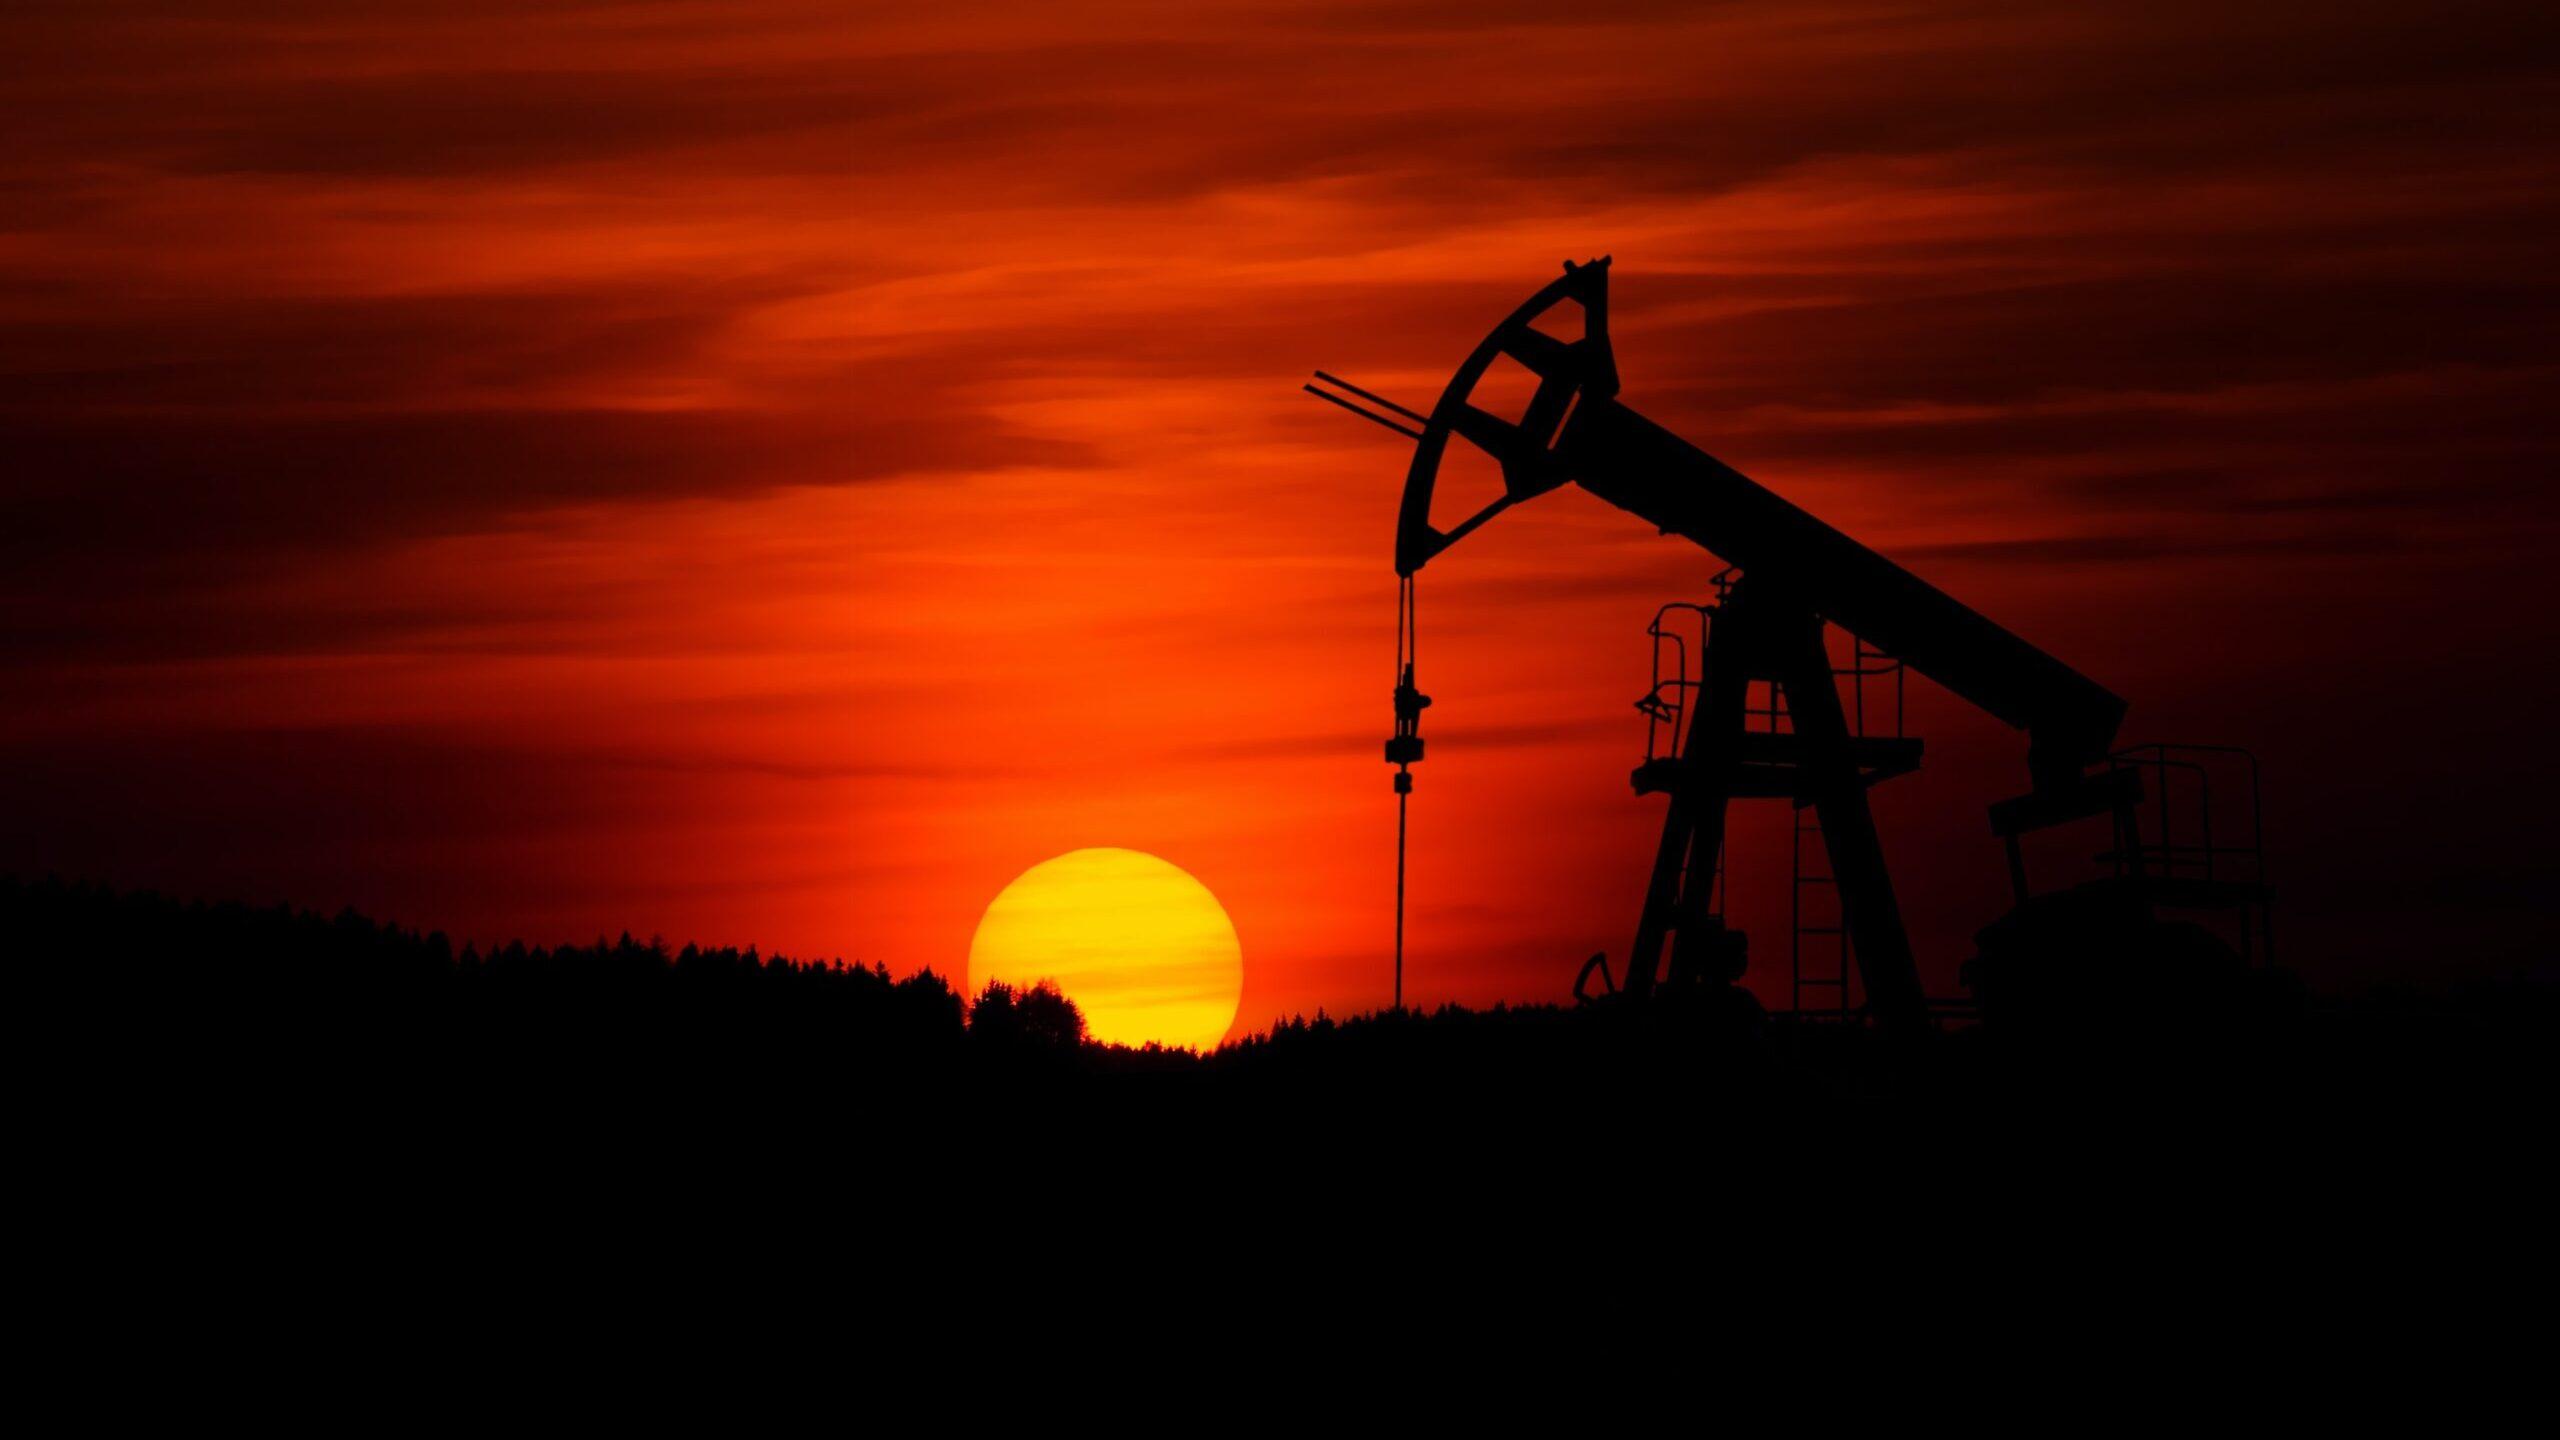 US Petroleum Data Show Healthy Demand, Making Oil Exports Less Lucrative